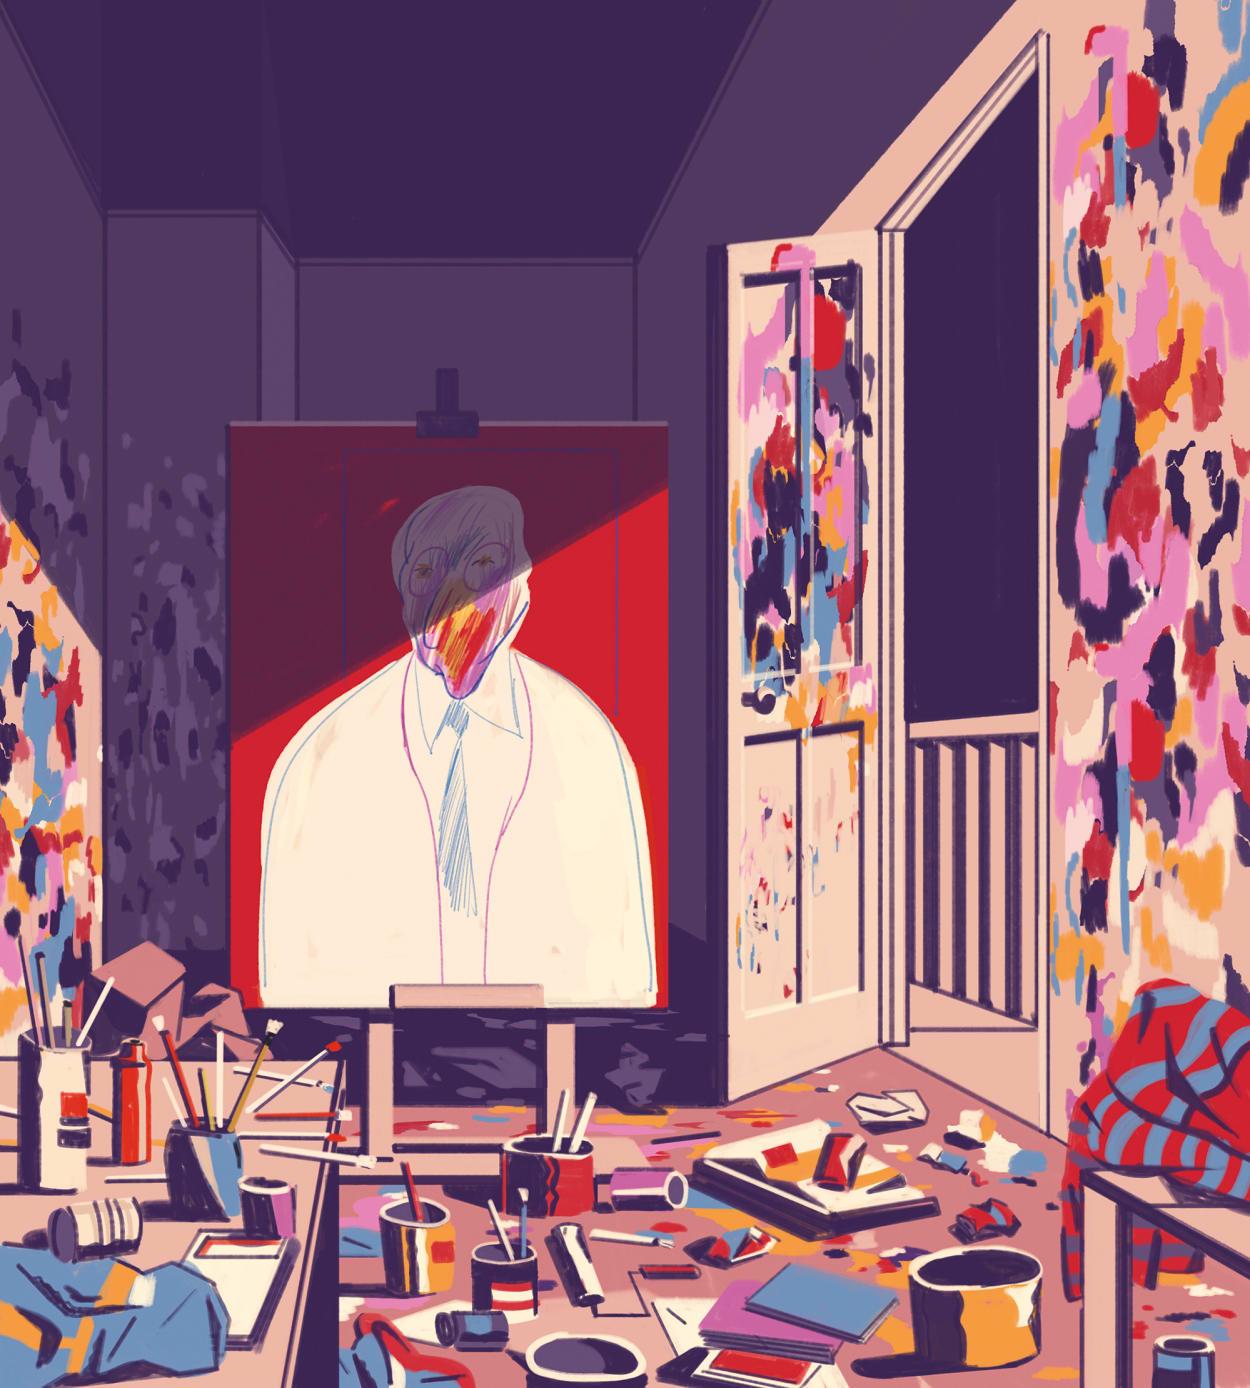 Francis Bacon, Illustration, Gemälde, Kunst